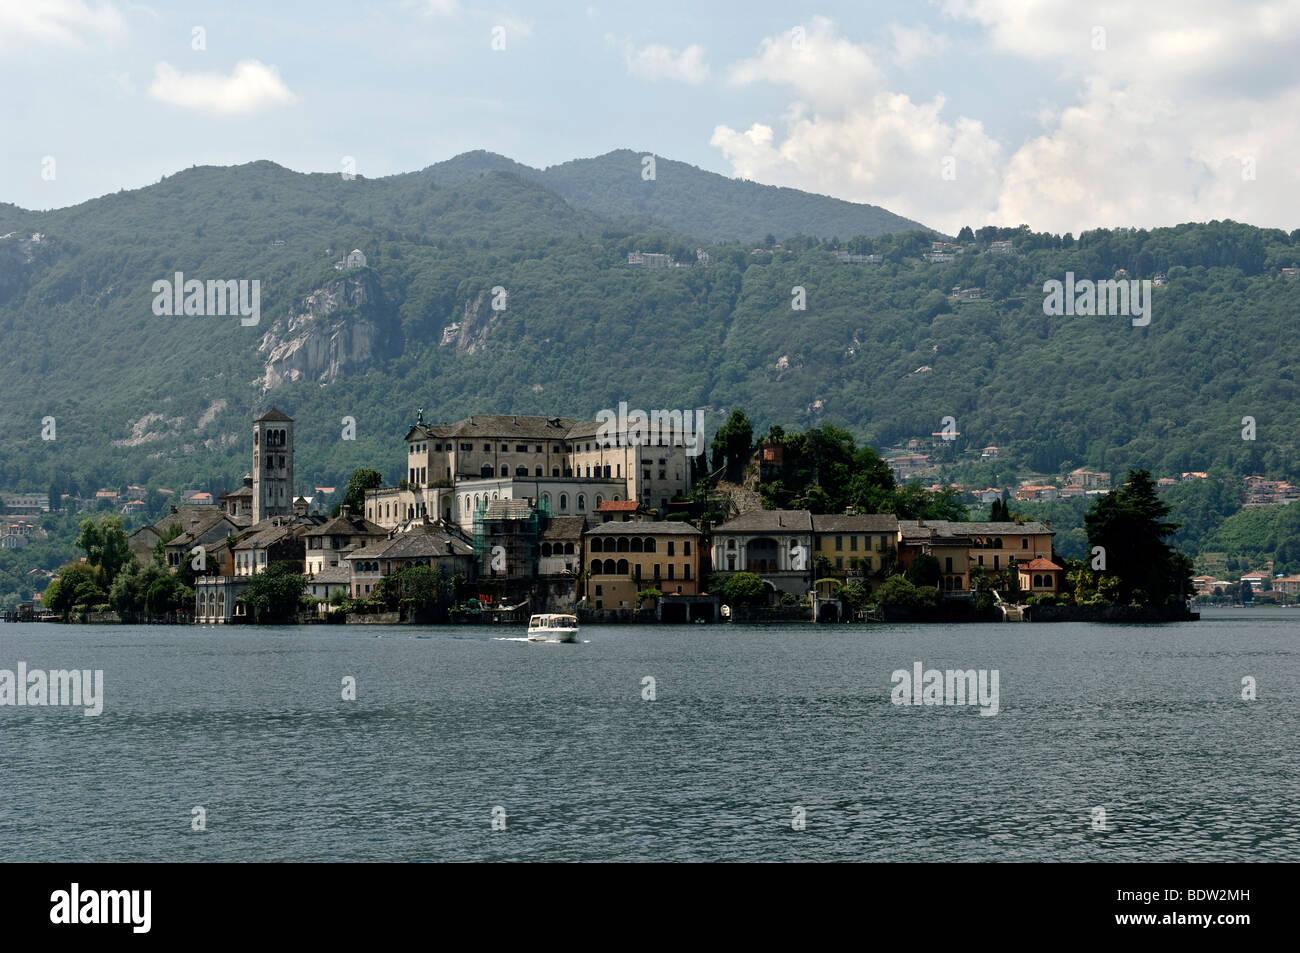 Island of San Giulio on Lake Orta, Lago d'Orta, Piedmont, Italy, Europe Stock Photo